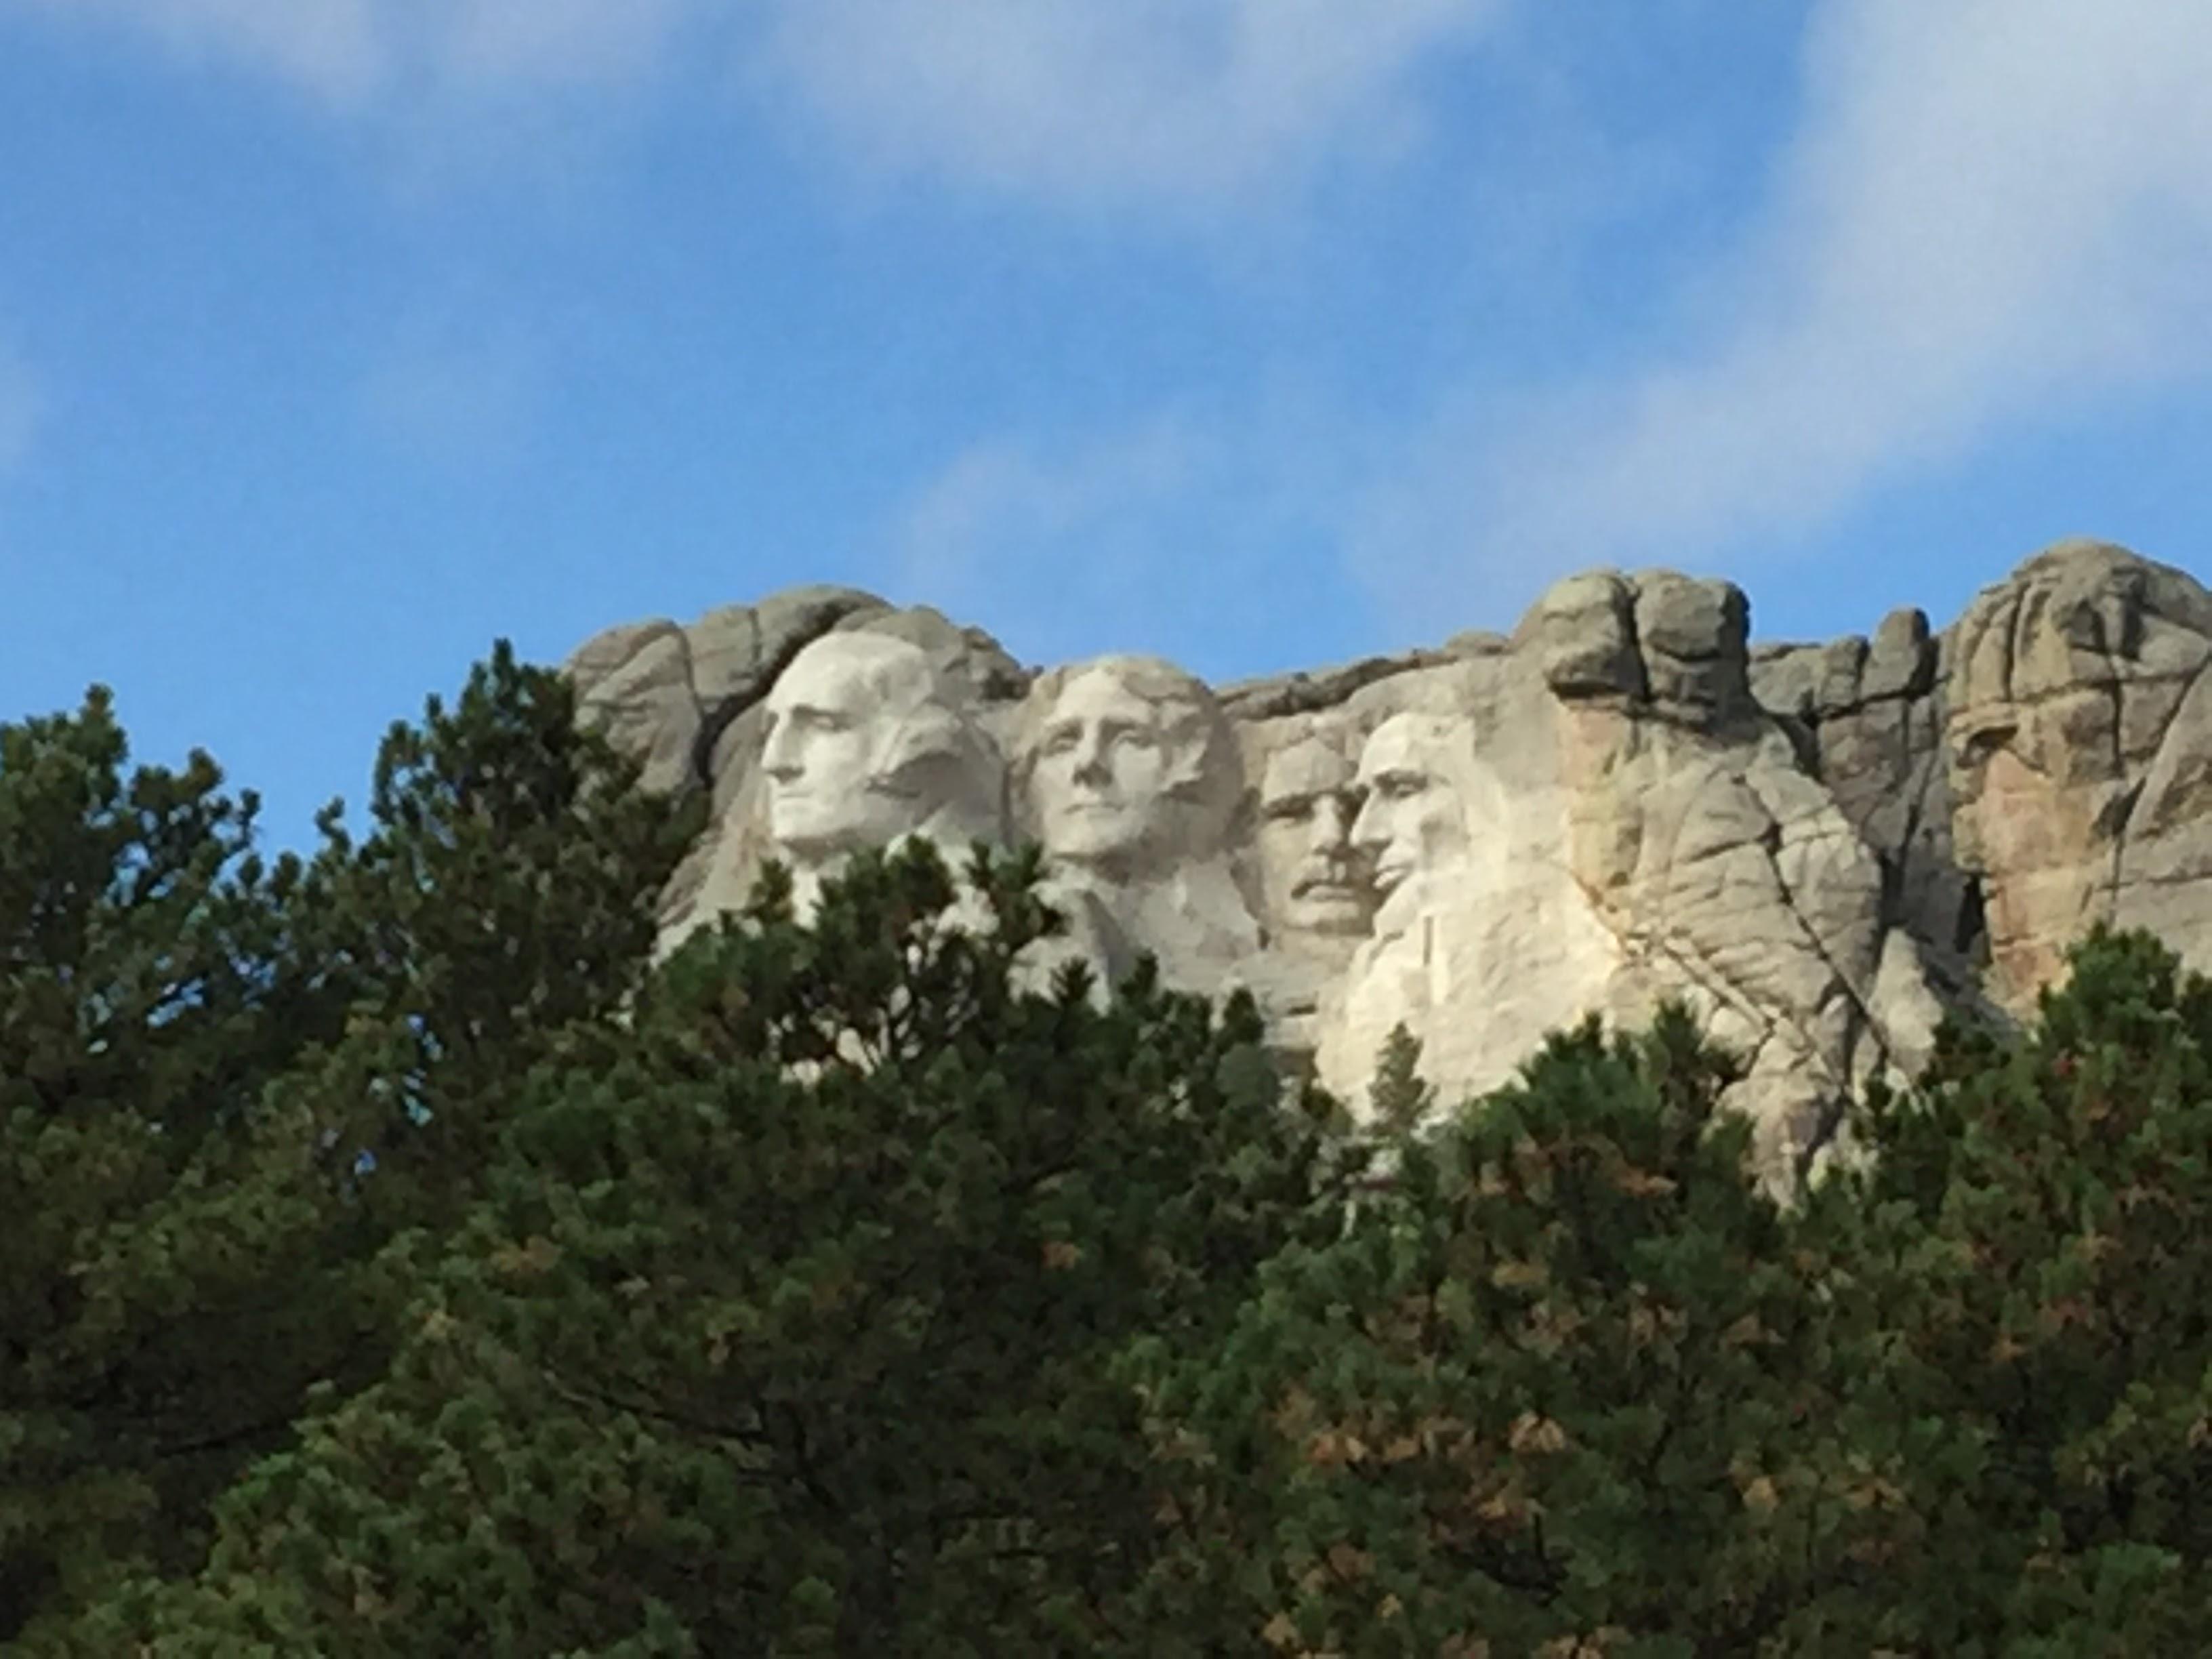 2017-09-17 Black Hills 21 Mt Rushmore 02